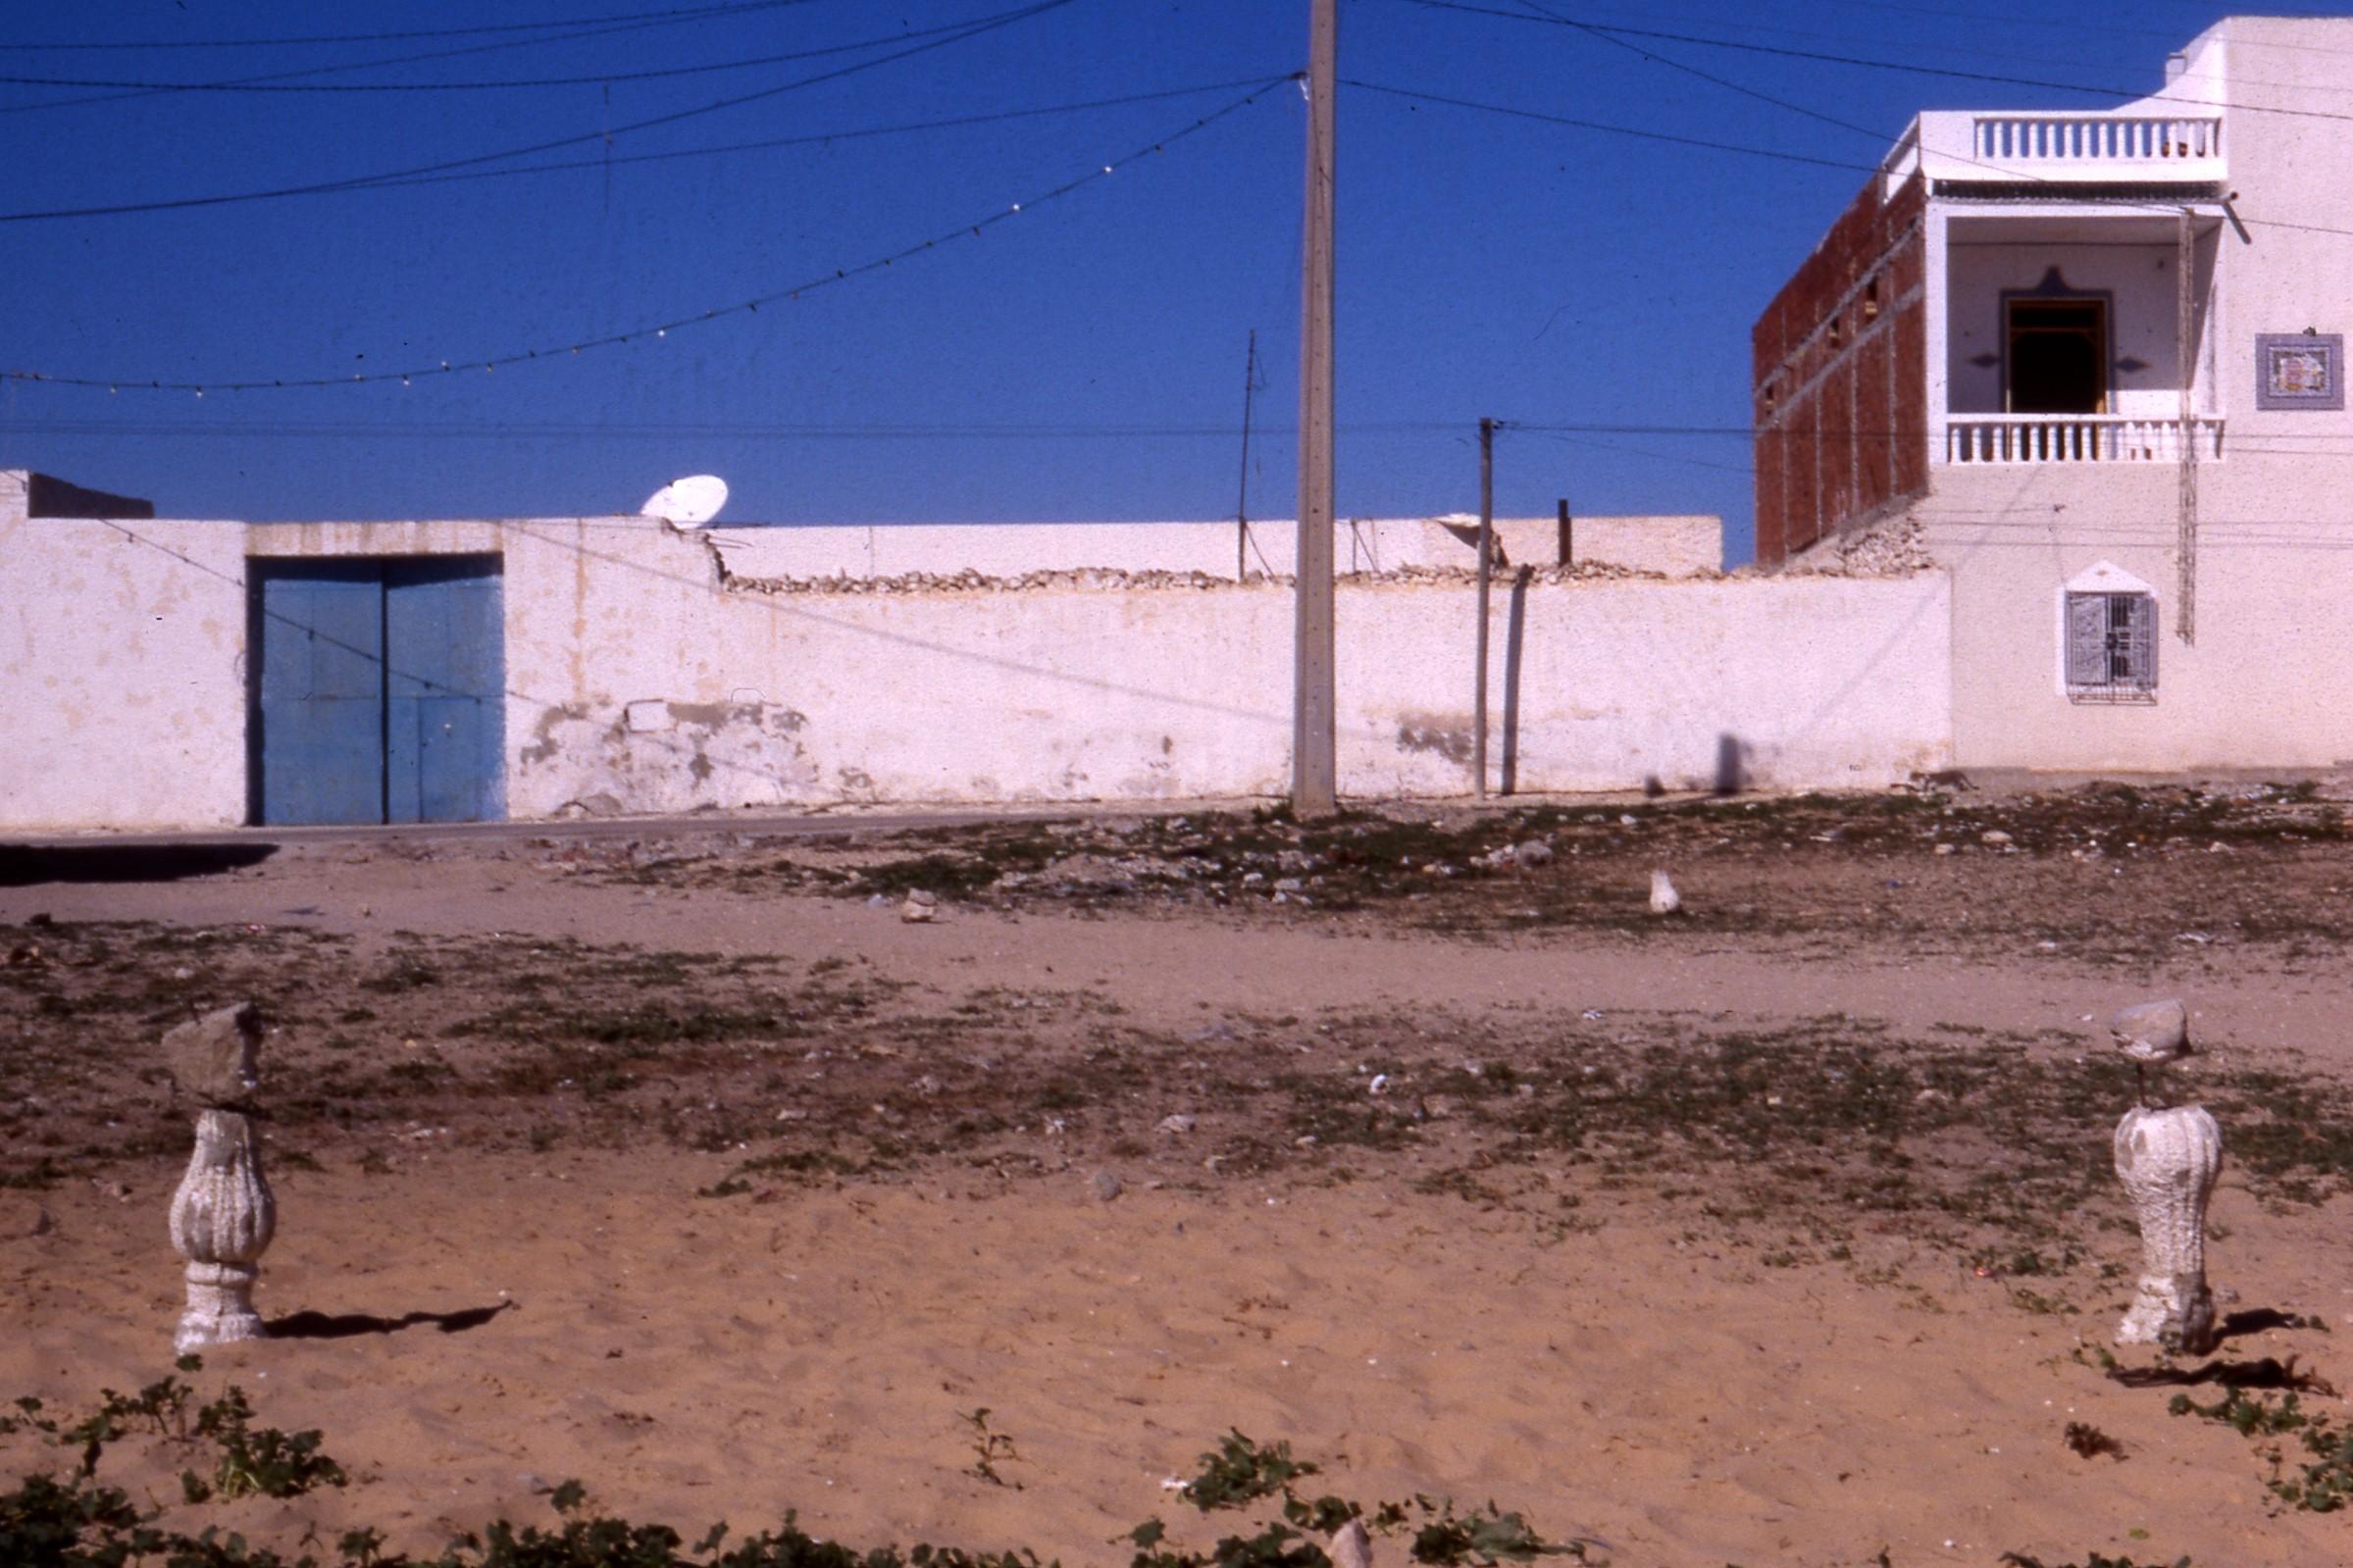 Hergla, Tunisia